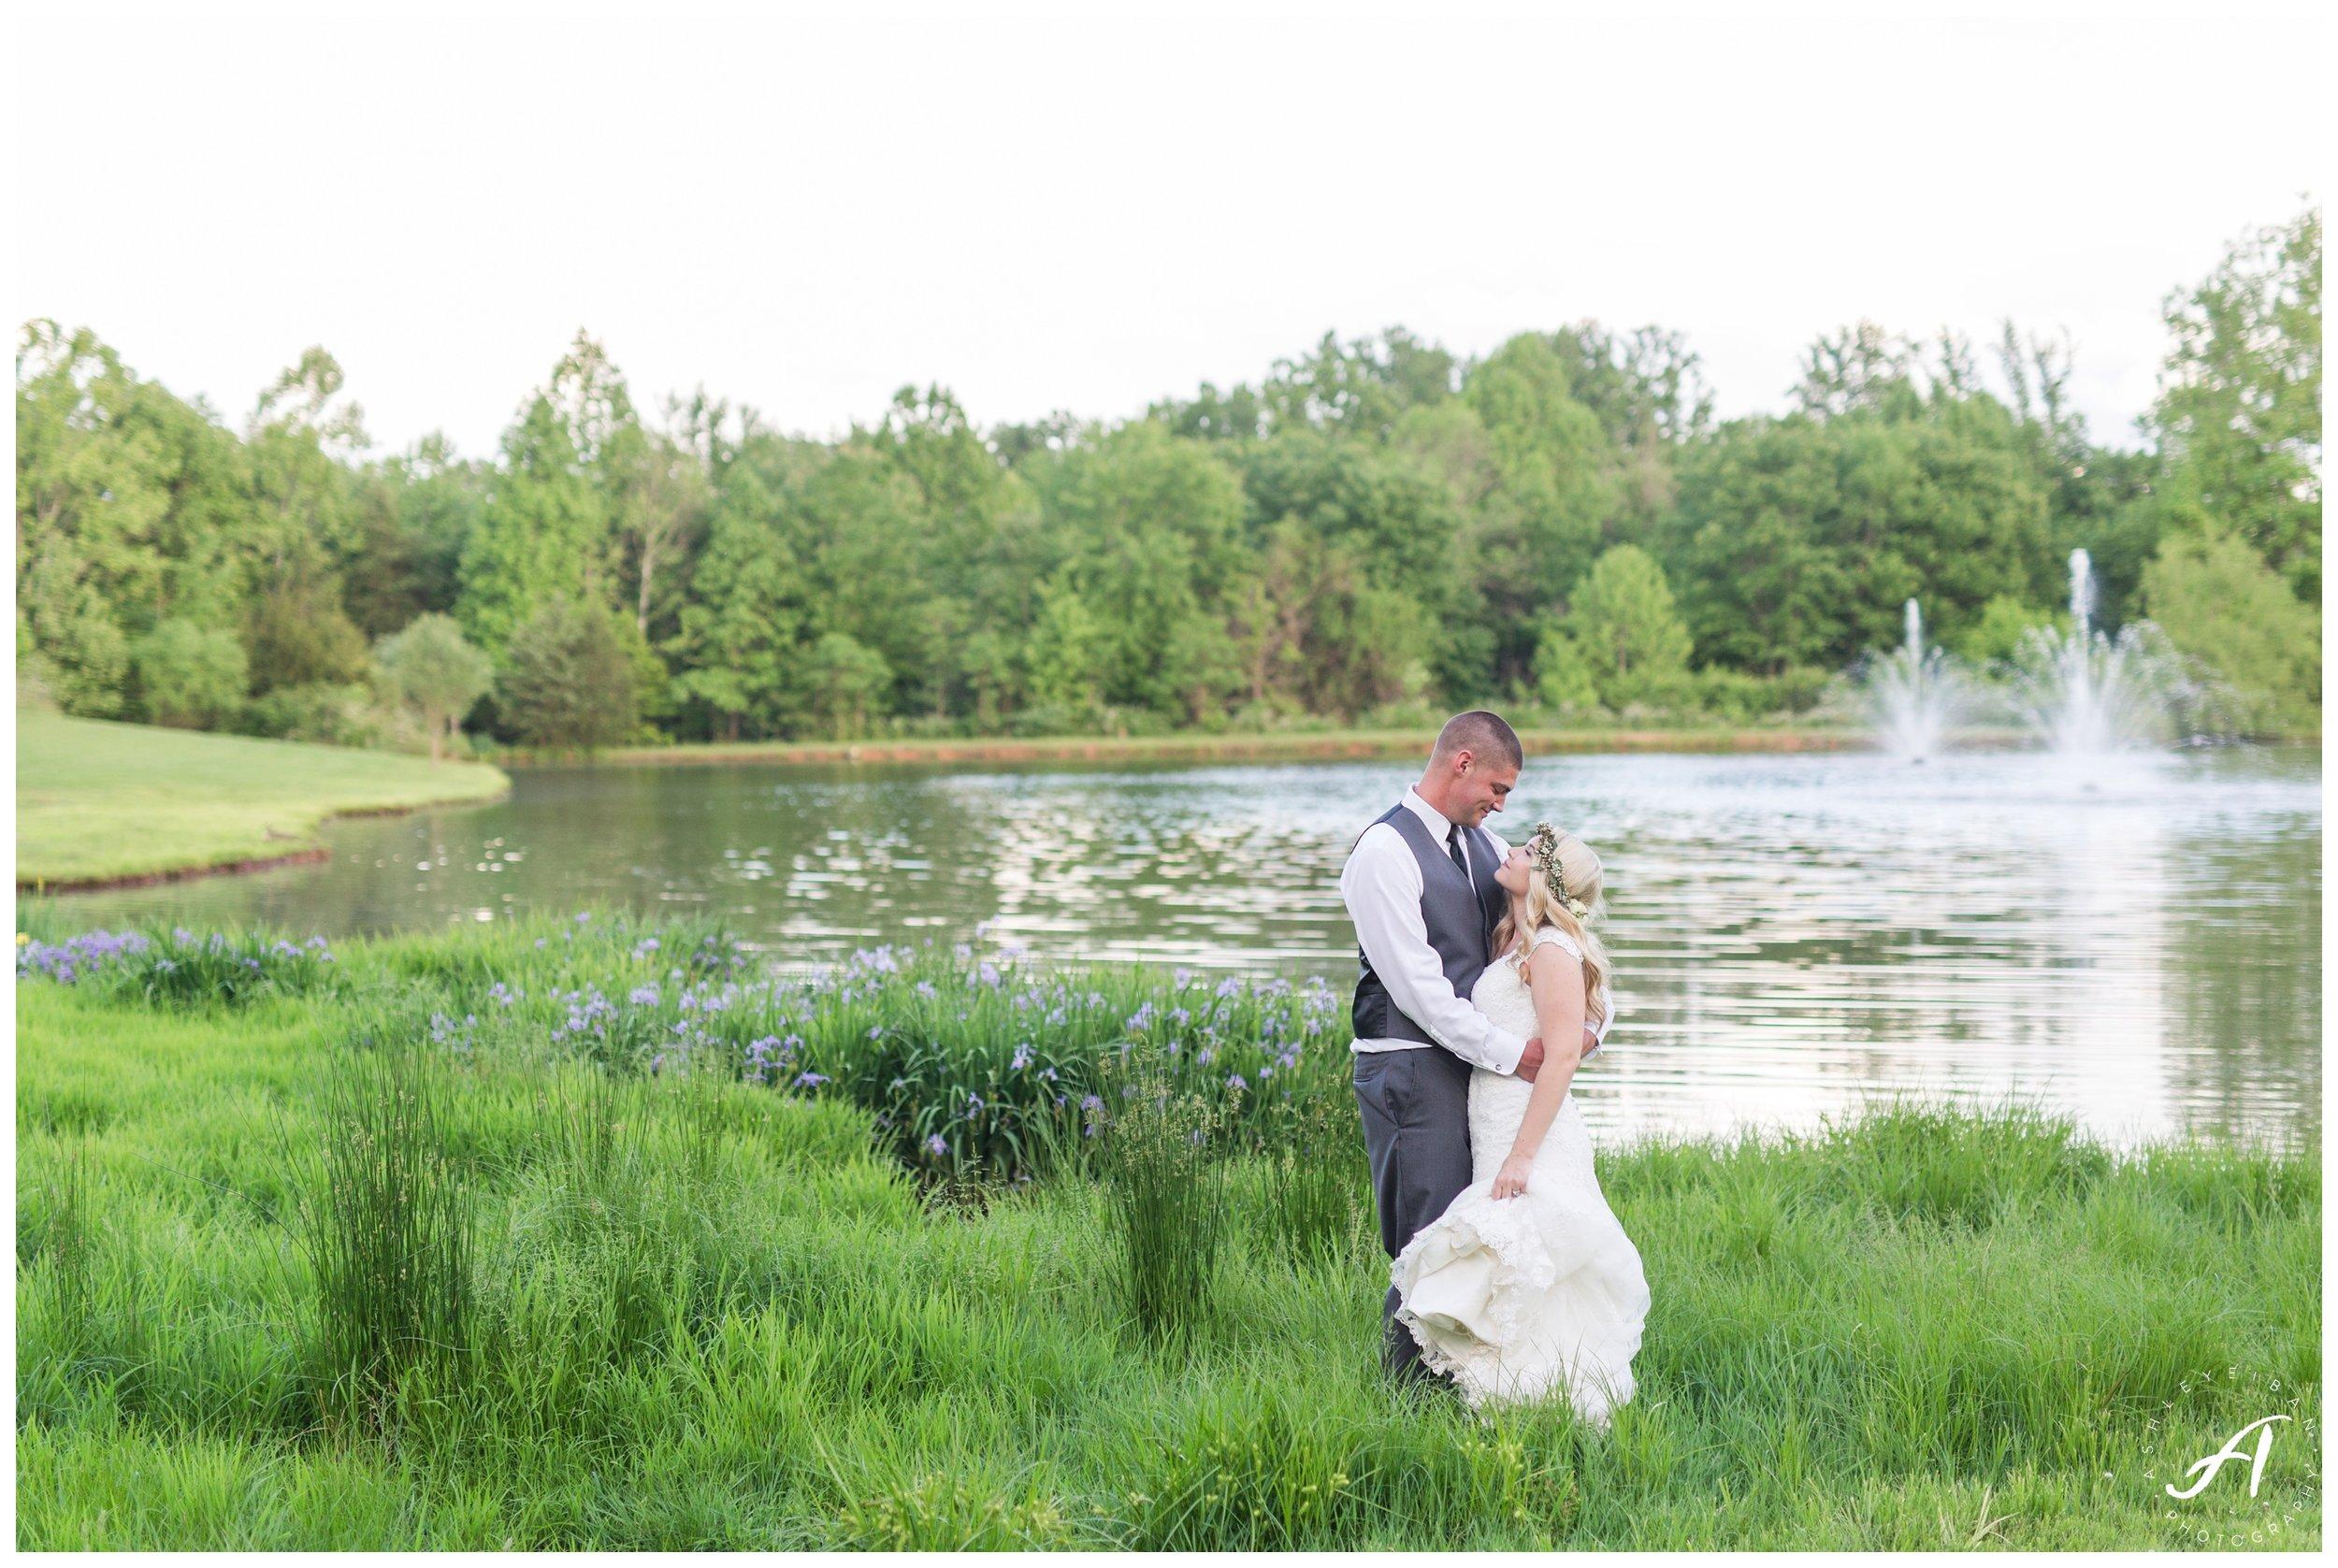 Write here…Lynchburg Virginia Wedding Photographer || Central Virginia Wedding Photos || Ashley Eiban Photography || www.ashleyeiban.com || The Trivium Wedding